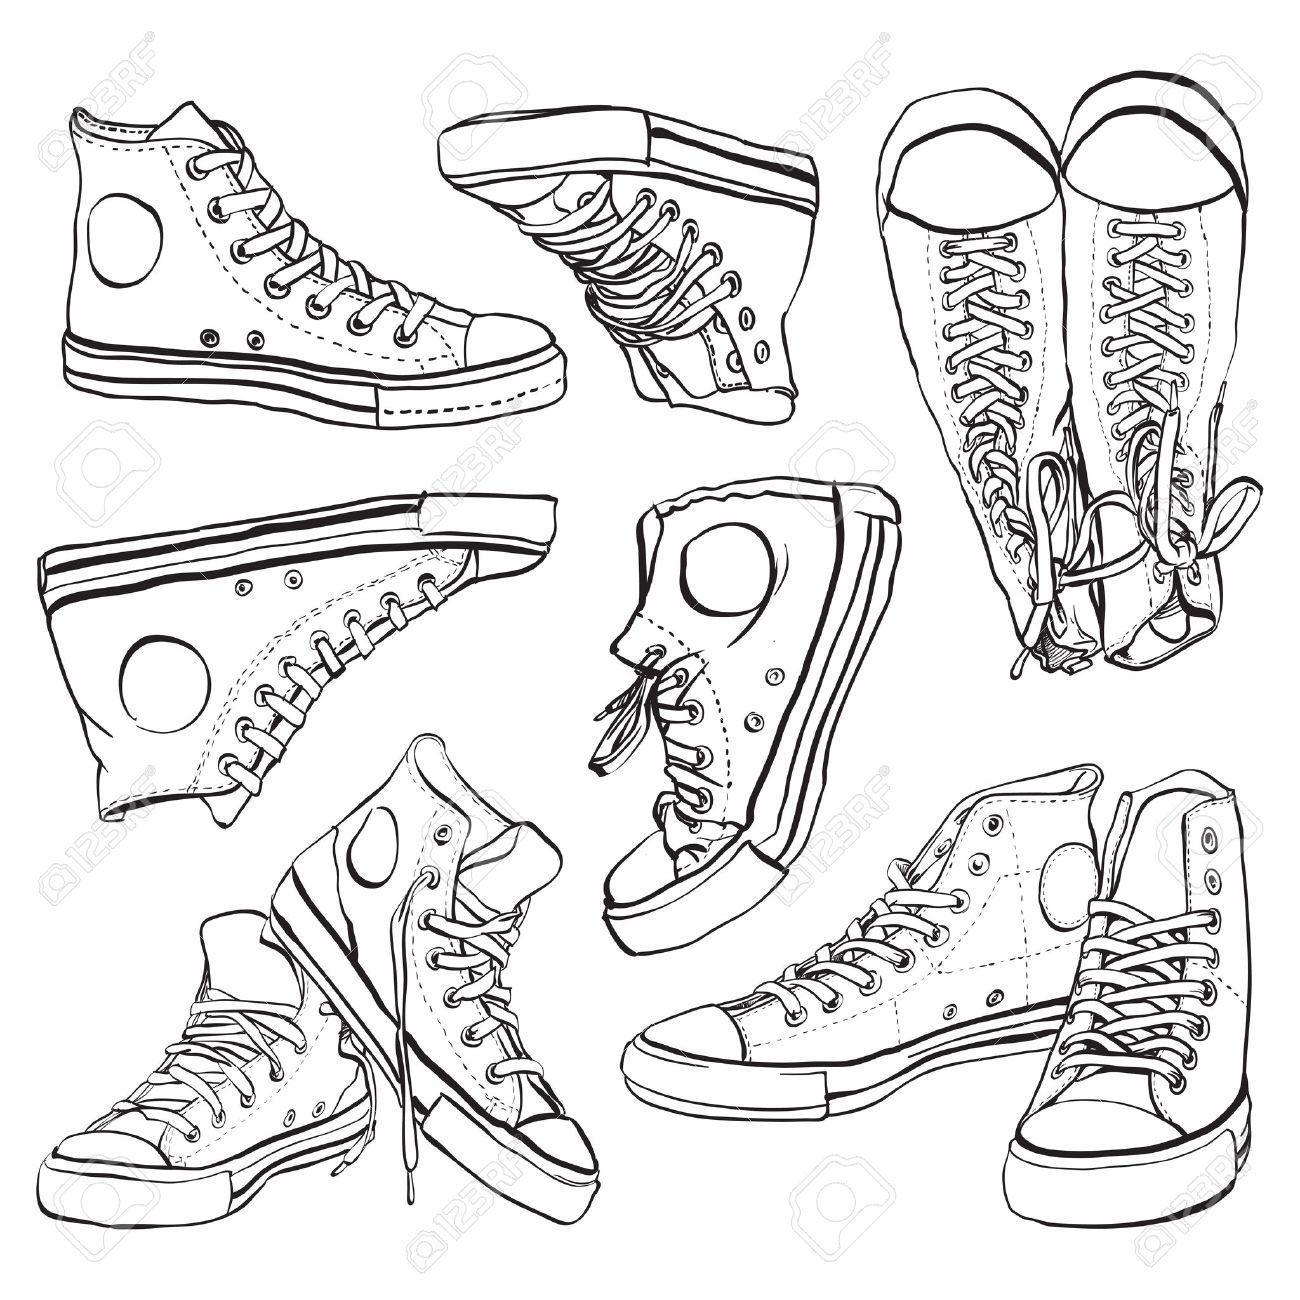 Image Result For Converse Illustration Sneakers Illustration Art Reference Art Reference Photos